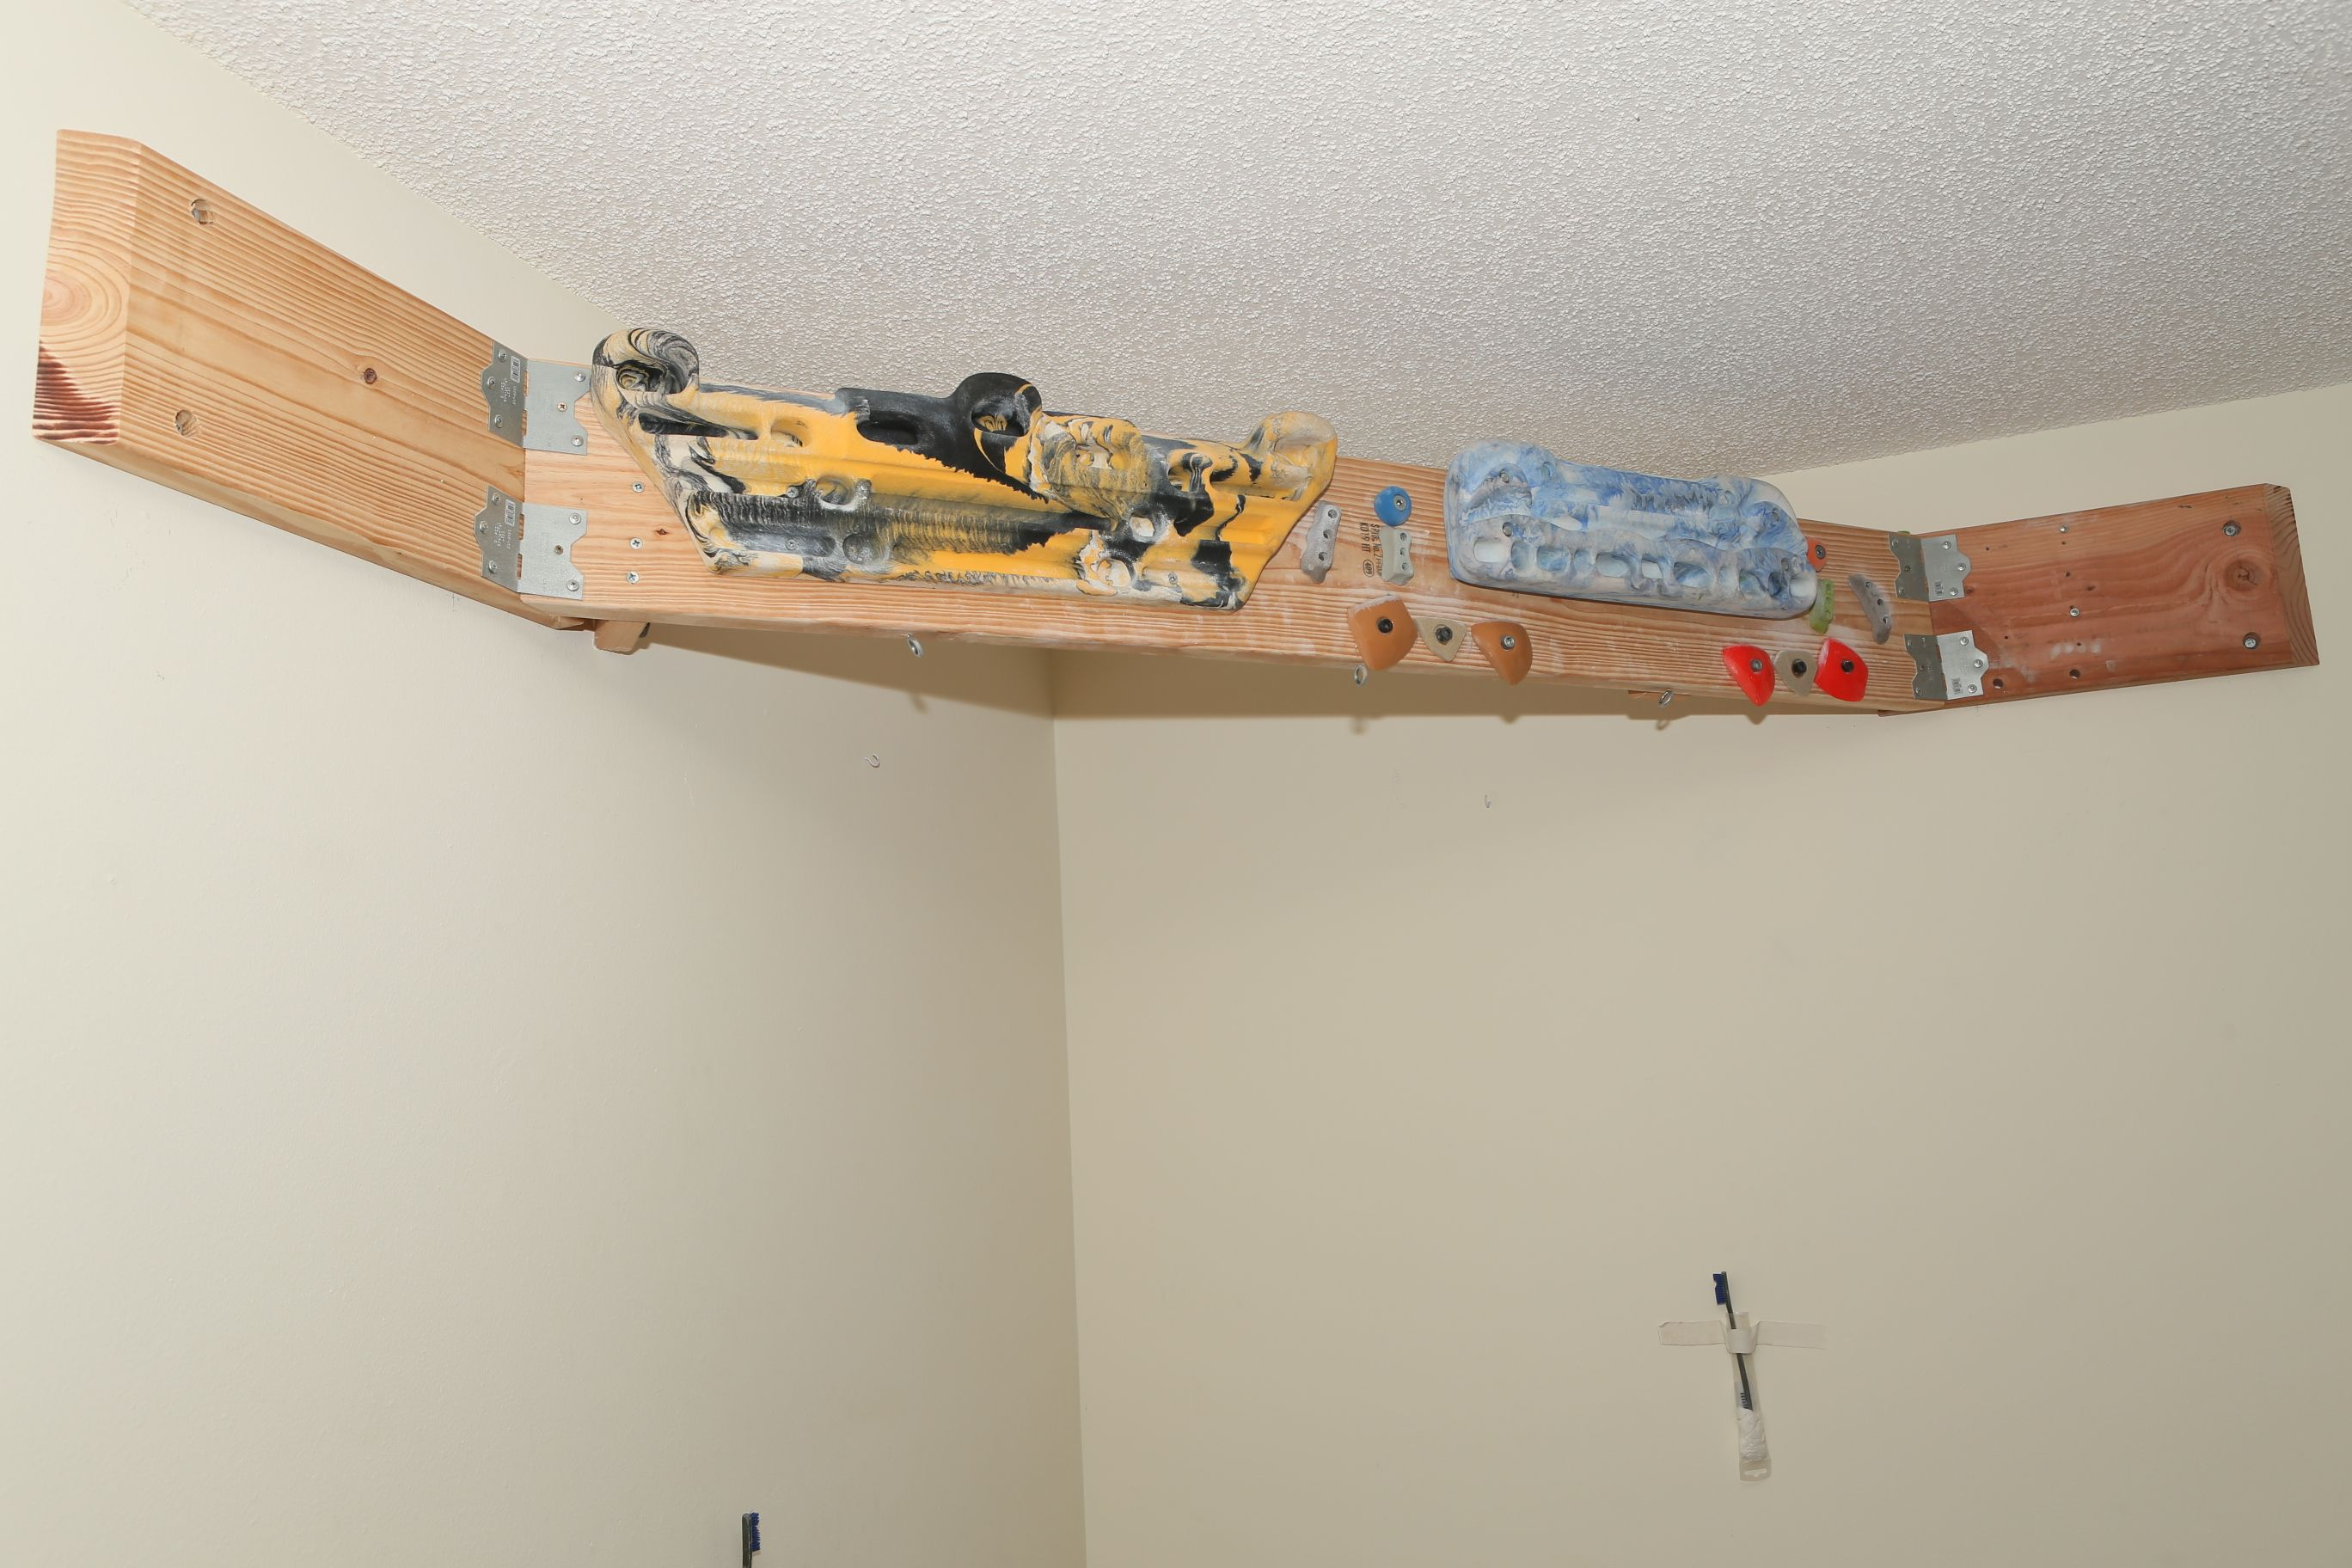 Corner Hangboard Mount Climbing Home Climbing Wall